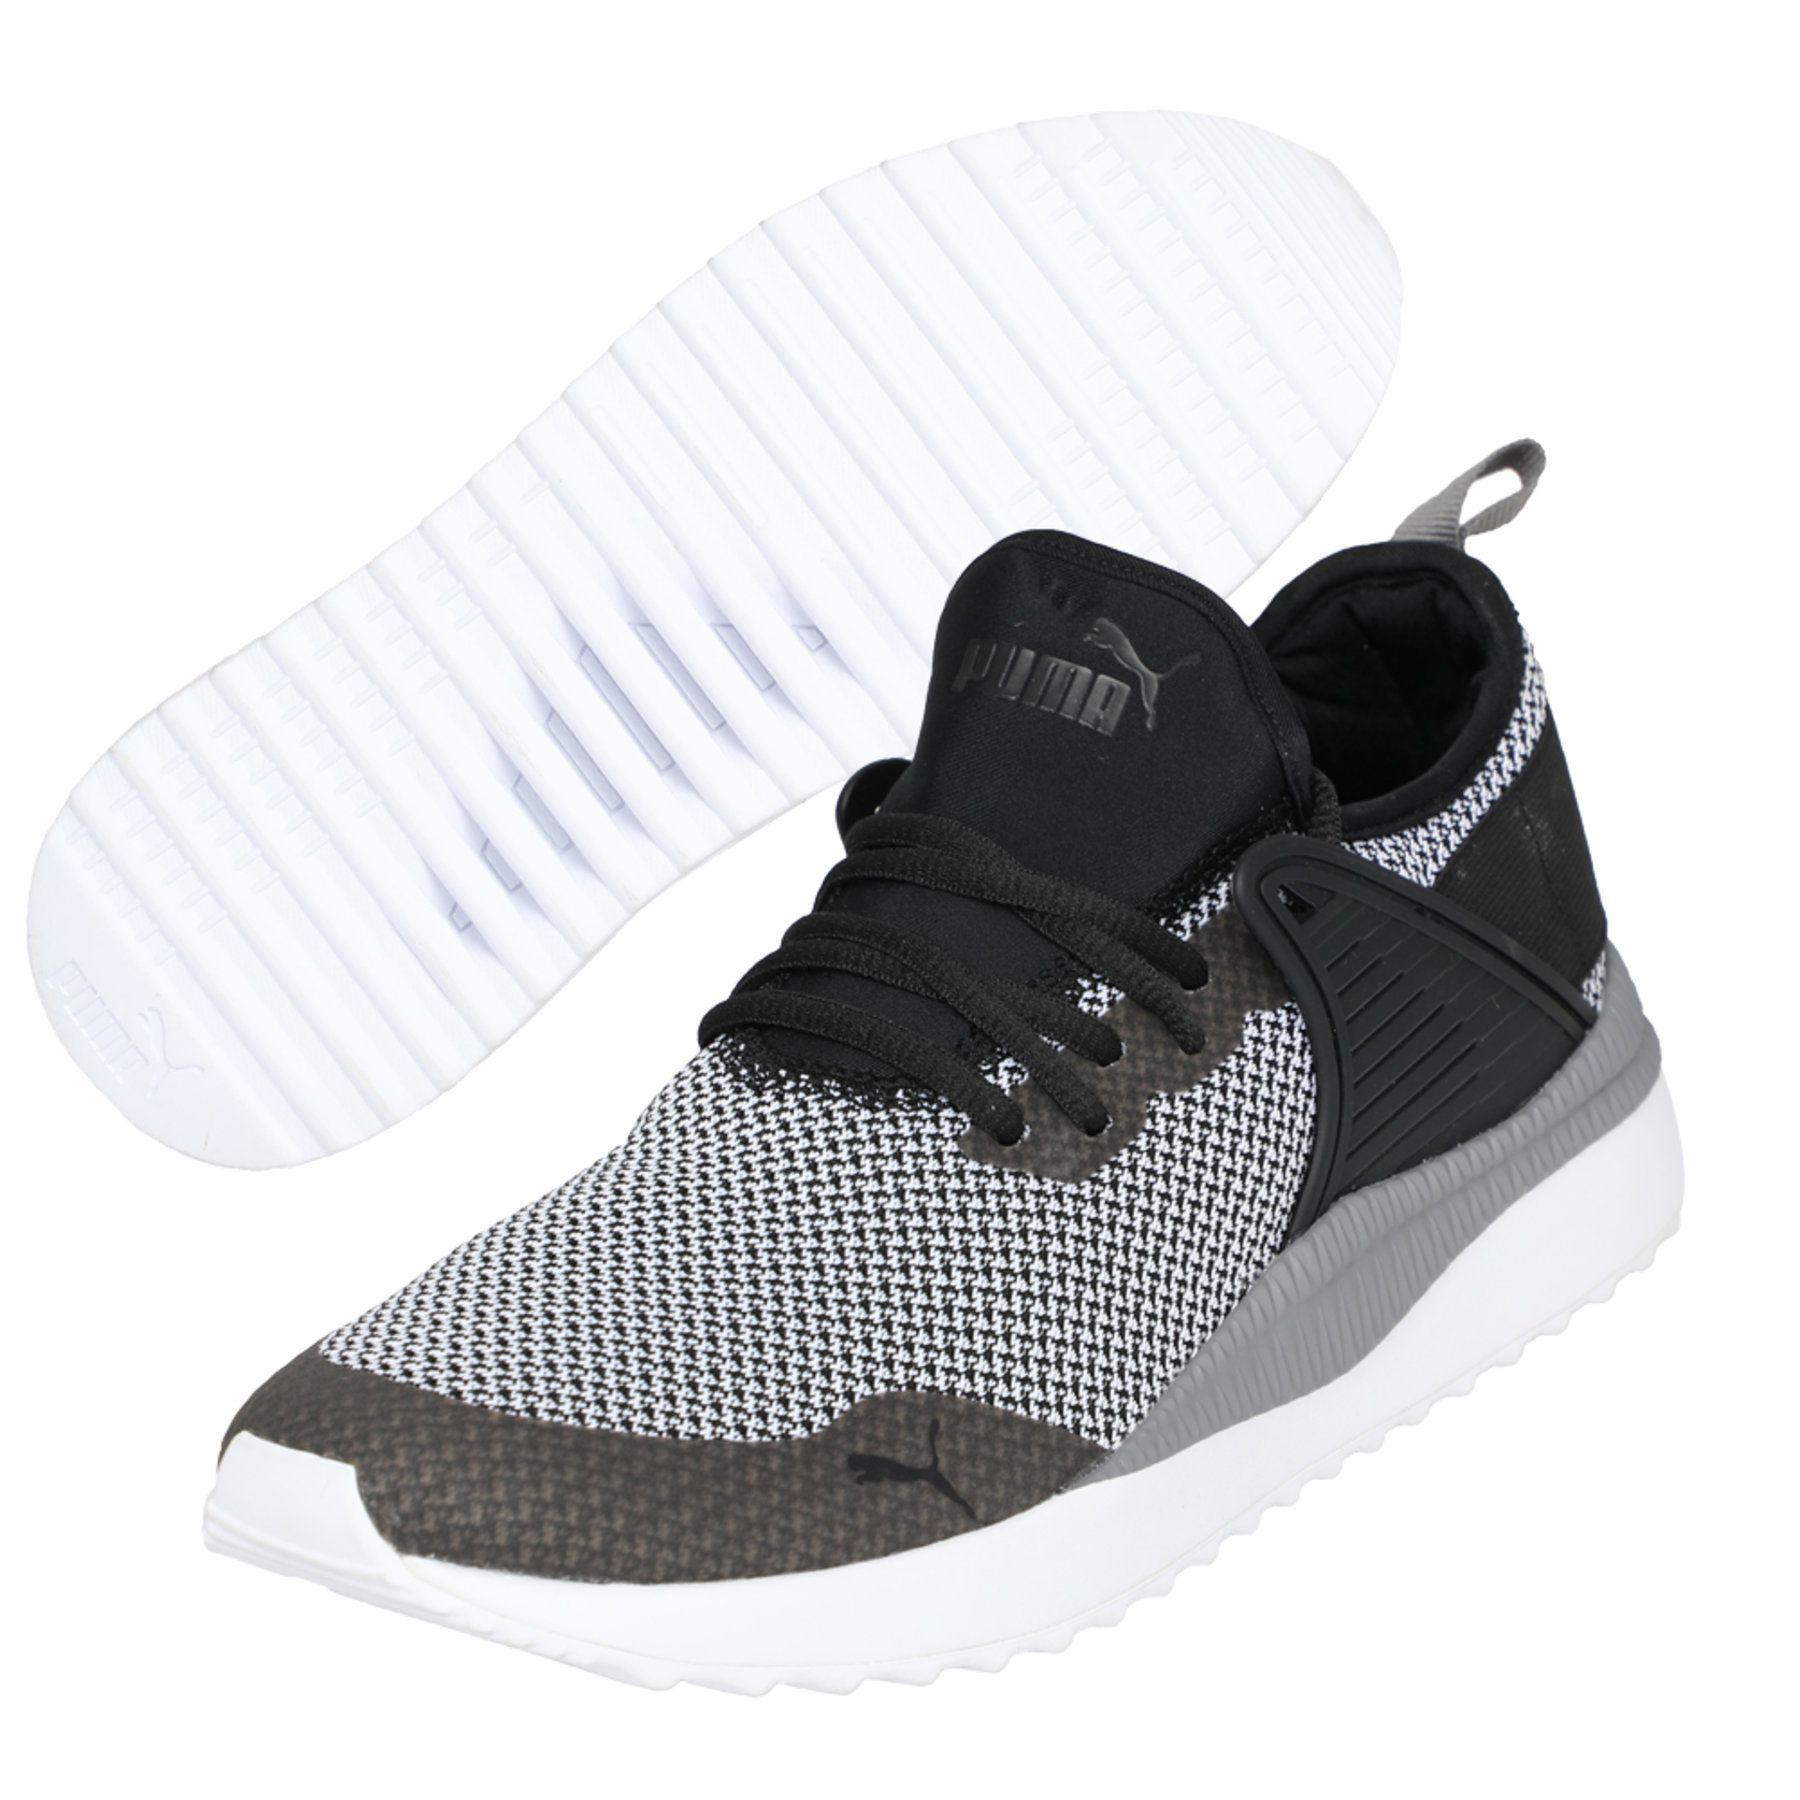 c1d5fa6e6d3 Puma Pacer Next Cage Gk Black Running Shoes - Buy Puma Pacer Next ...